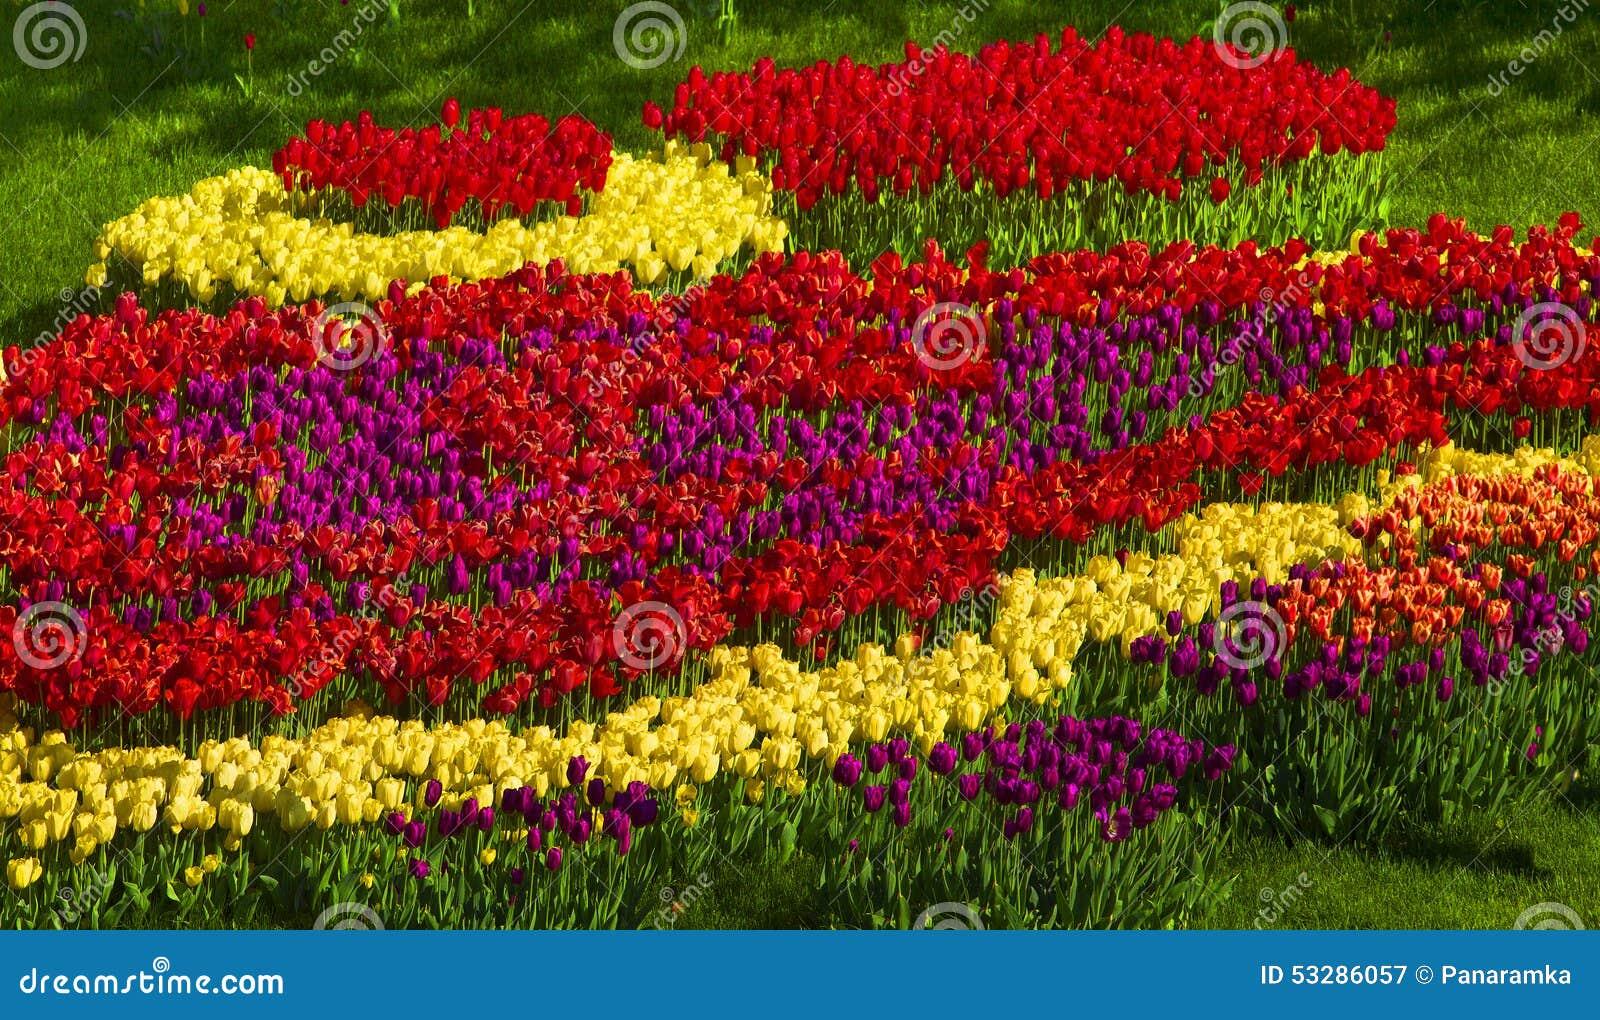 Tulips Spring Flowers Stock Image Image Of Garden 53286057